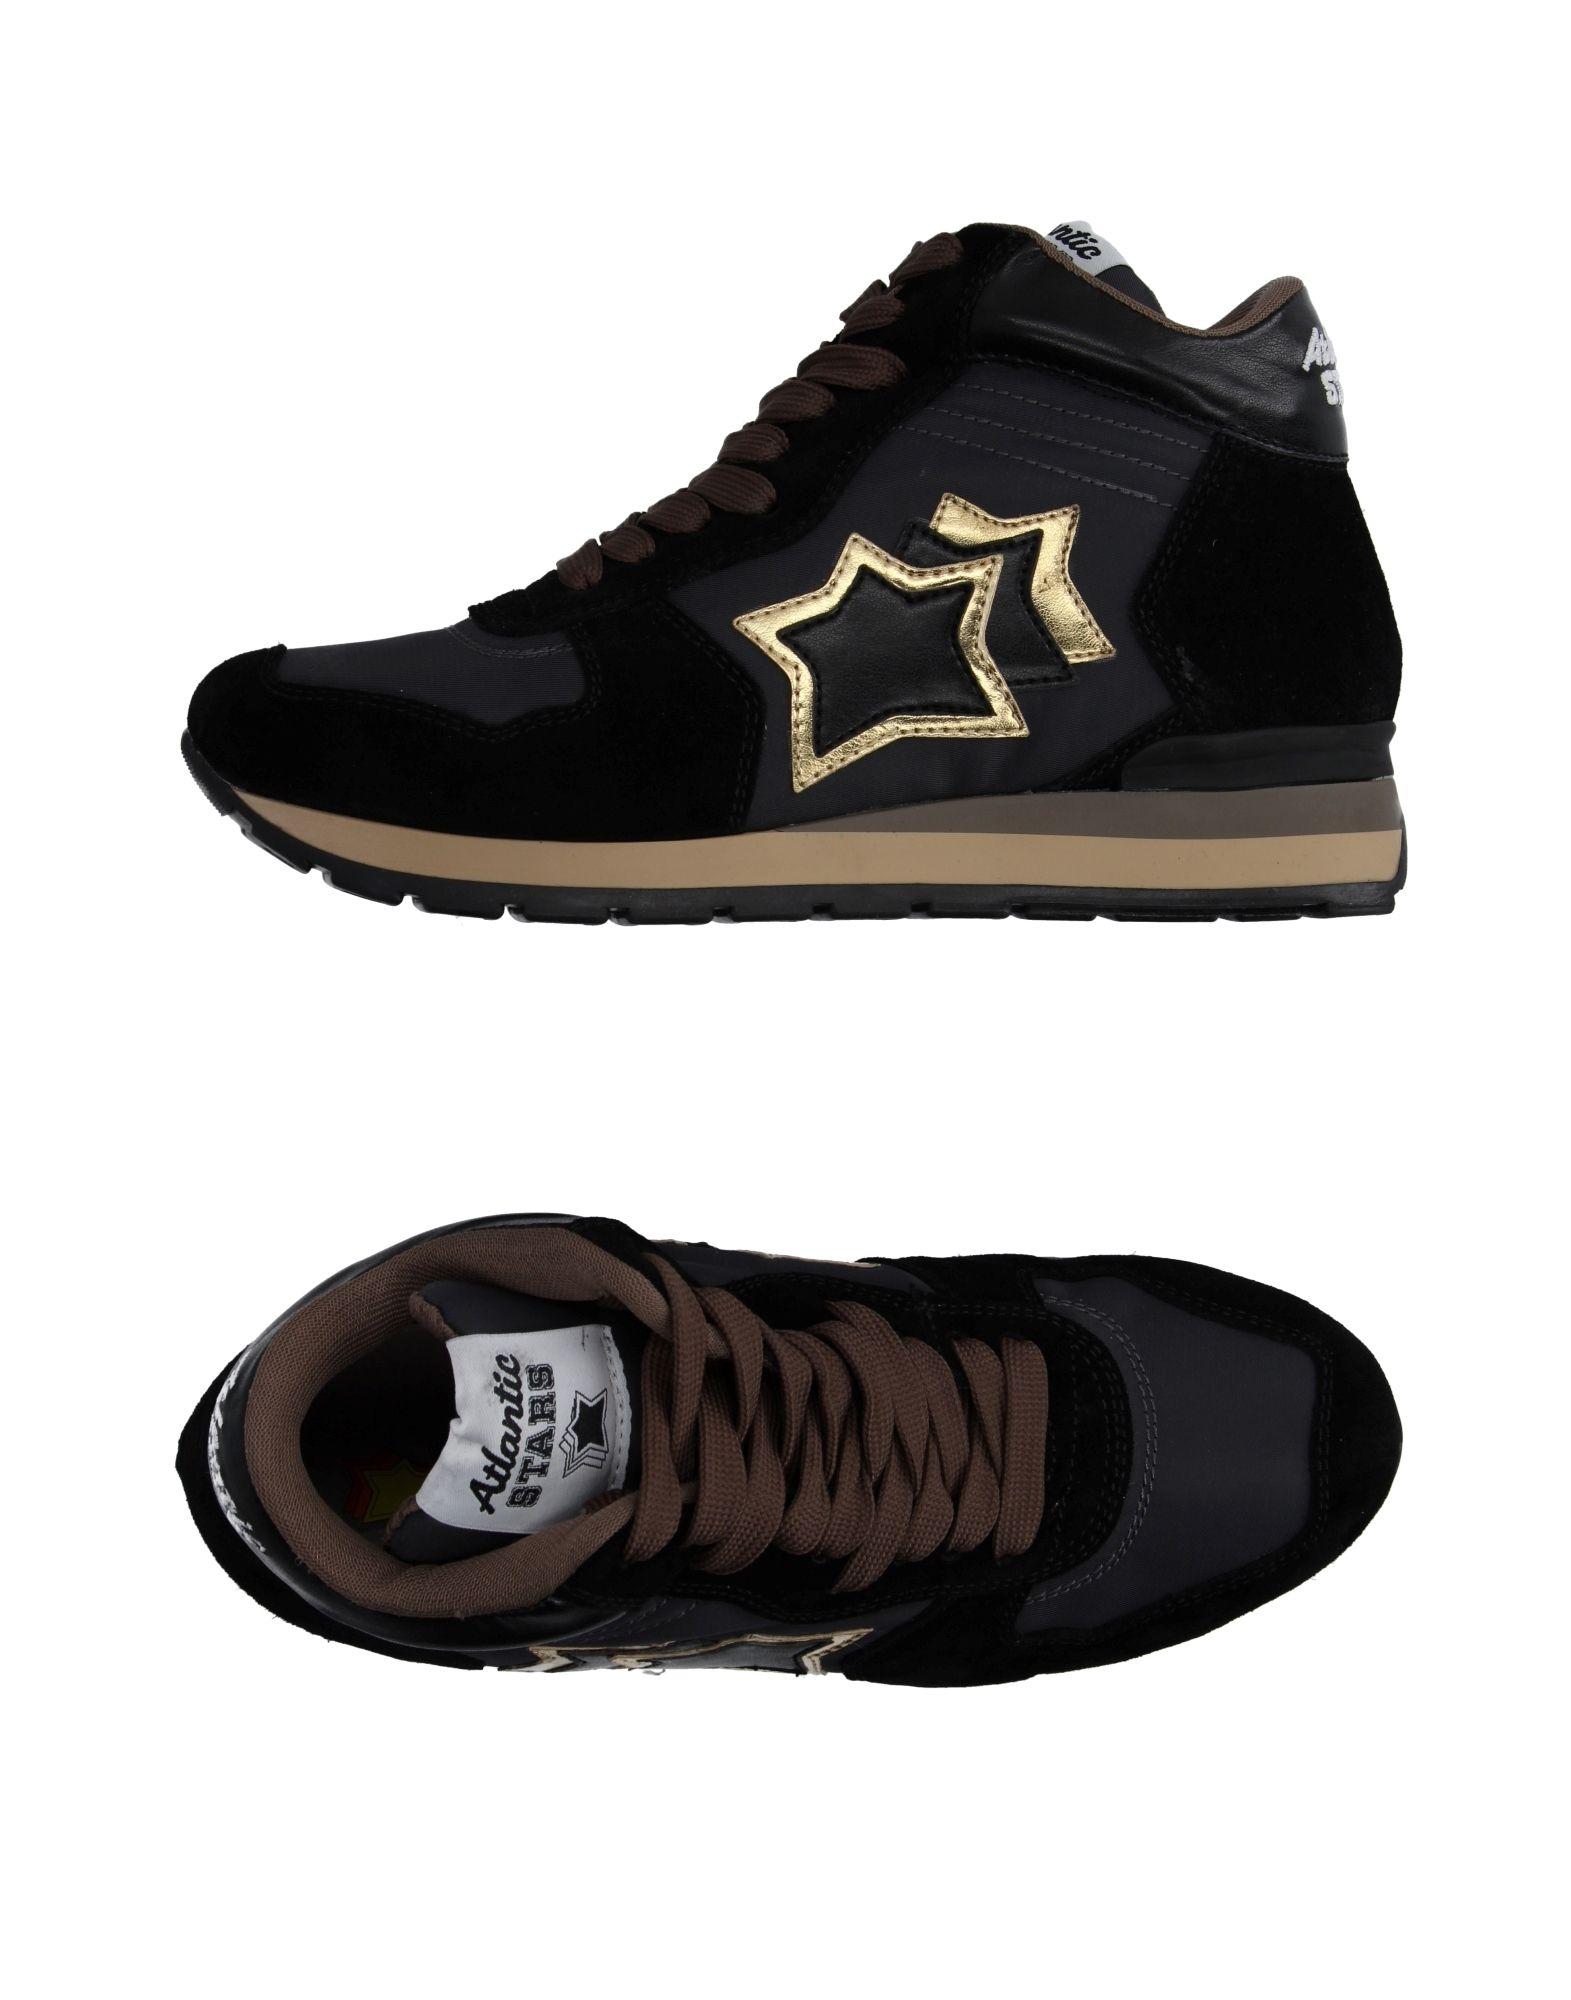 Atlantic Stars Sneakers Sneakers - Women Atlantic Stars Sneakers Sneakers online on  United Kingdom - 11061873KB 0b711e